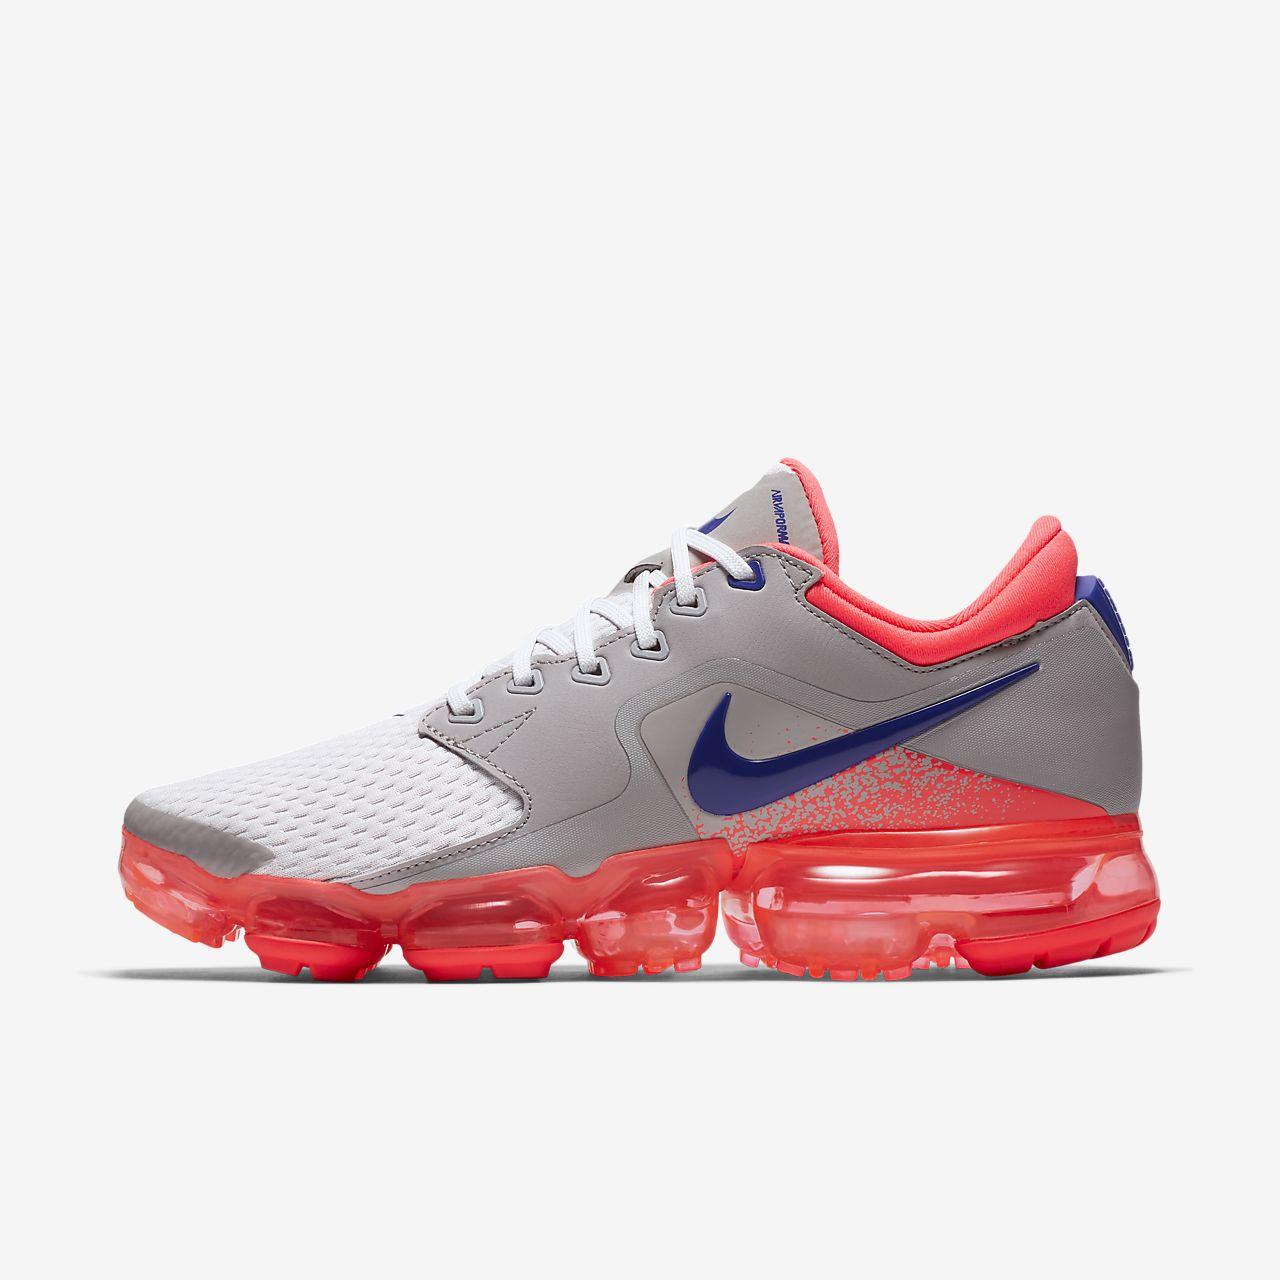 save off e4884 b1834 Scarpa Nike Air VaporMax - Donna